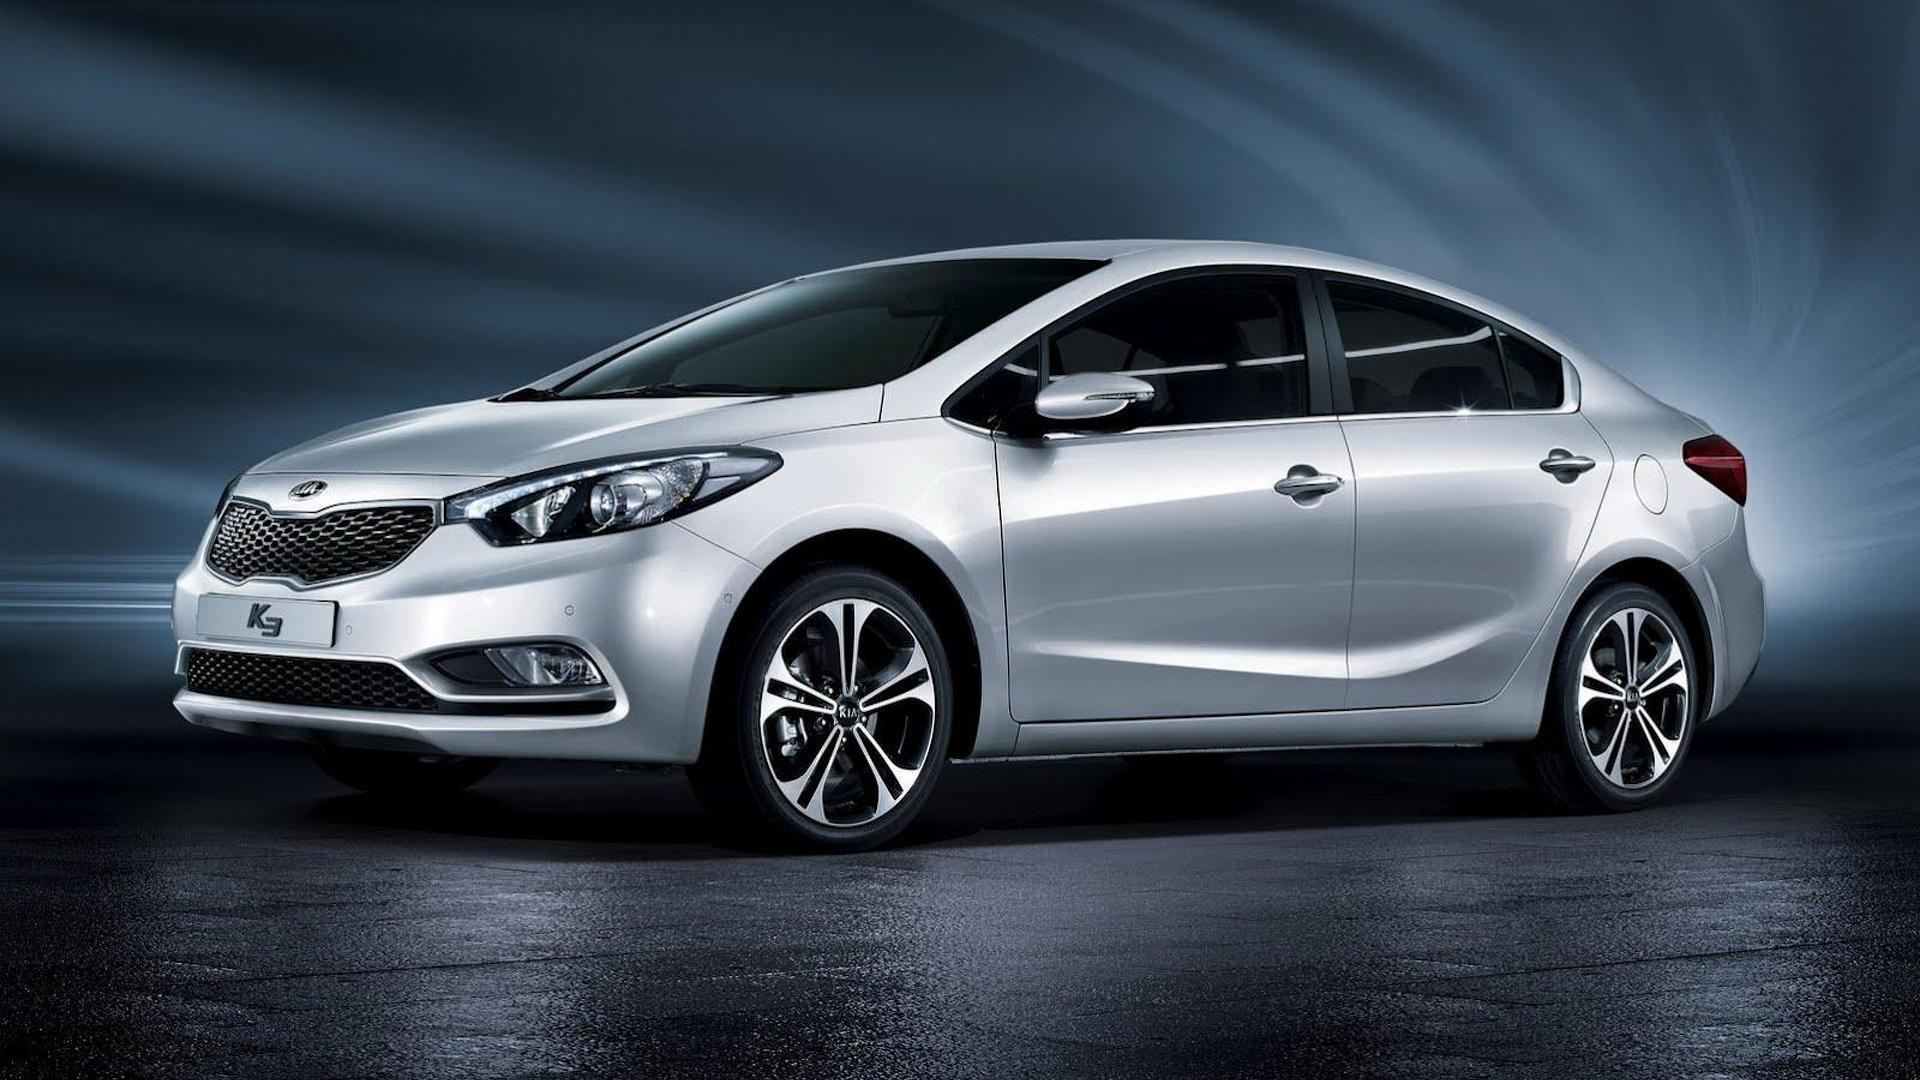 All-new Kia Cerato (Forte) goes official